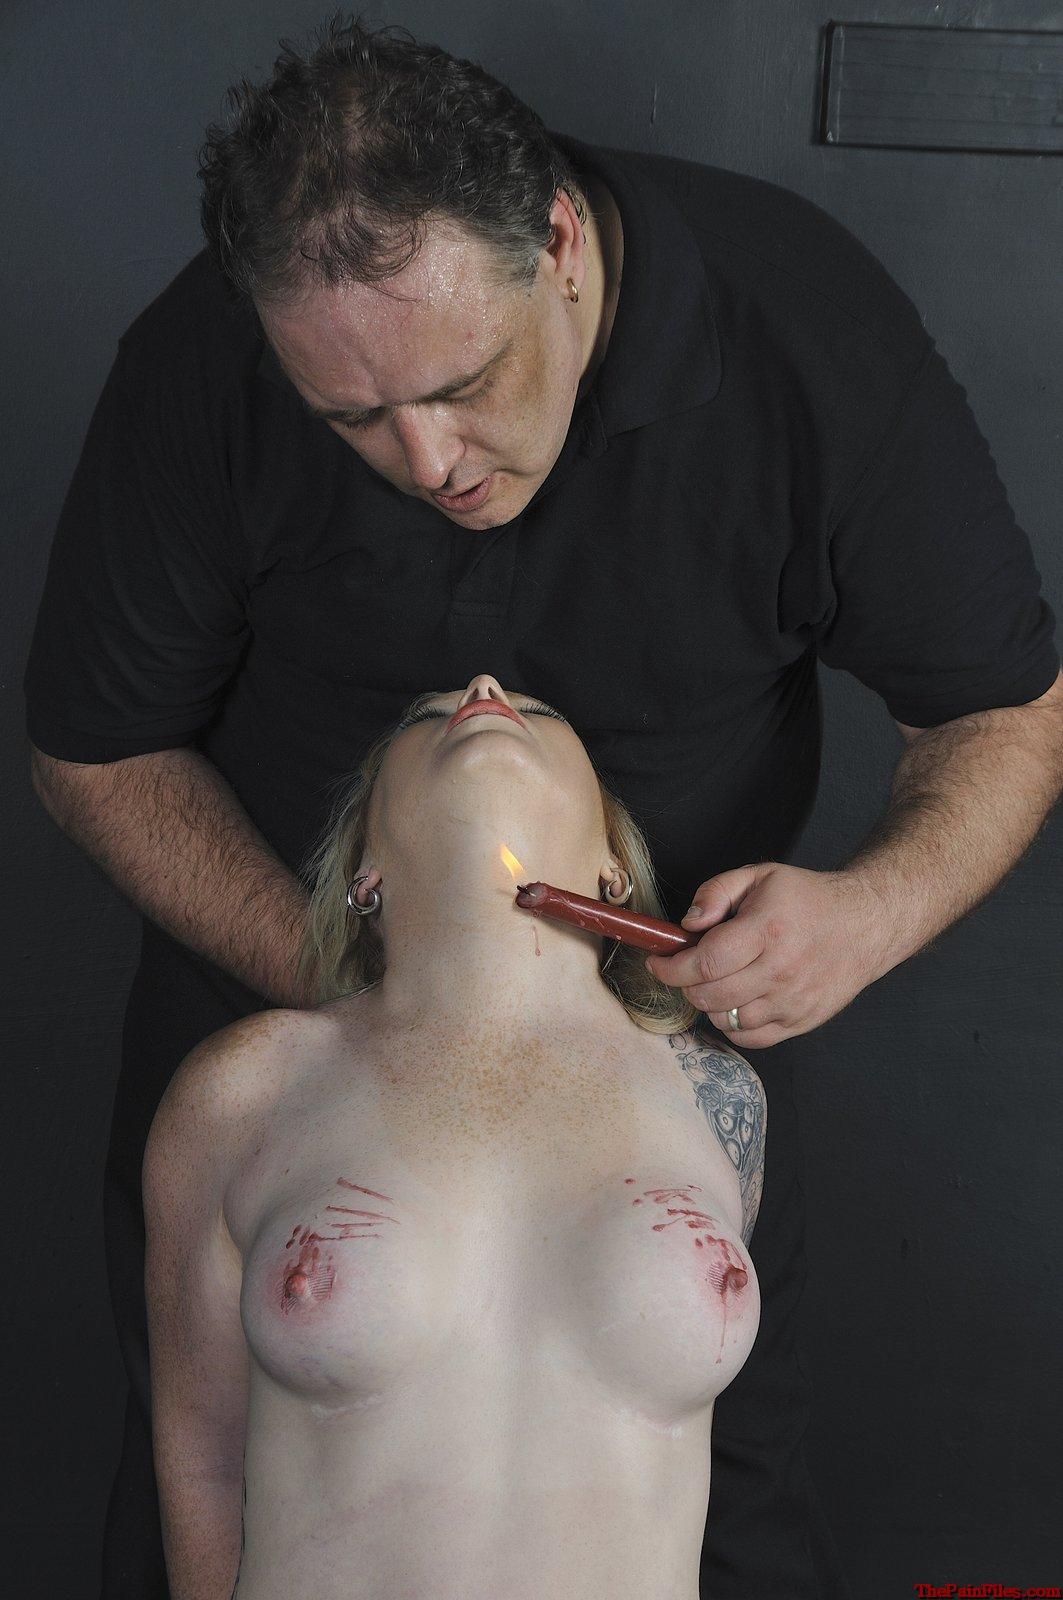 Free punishment porn pics